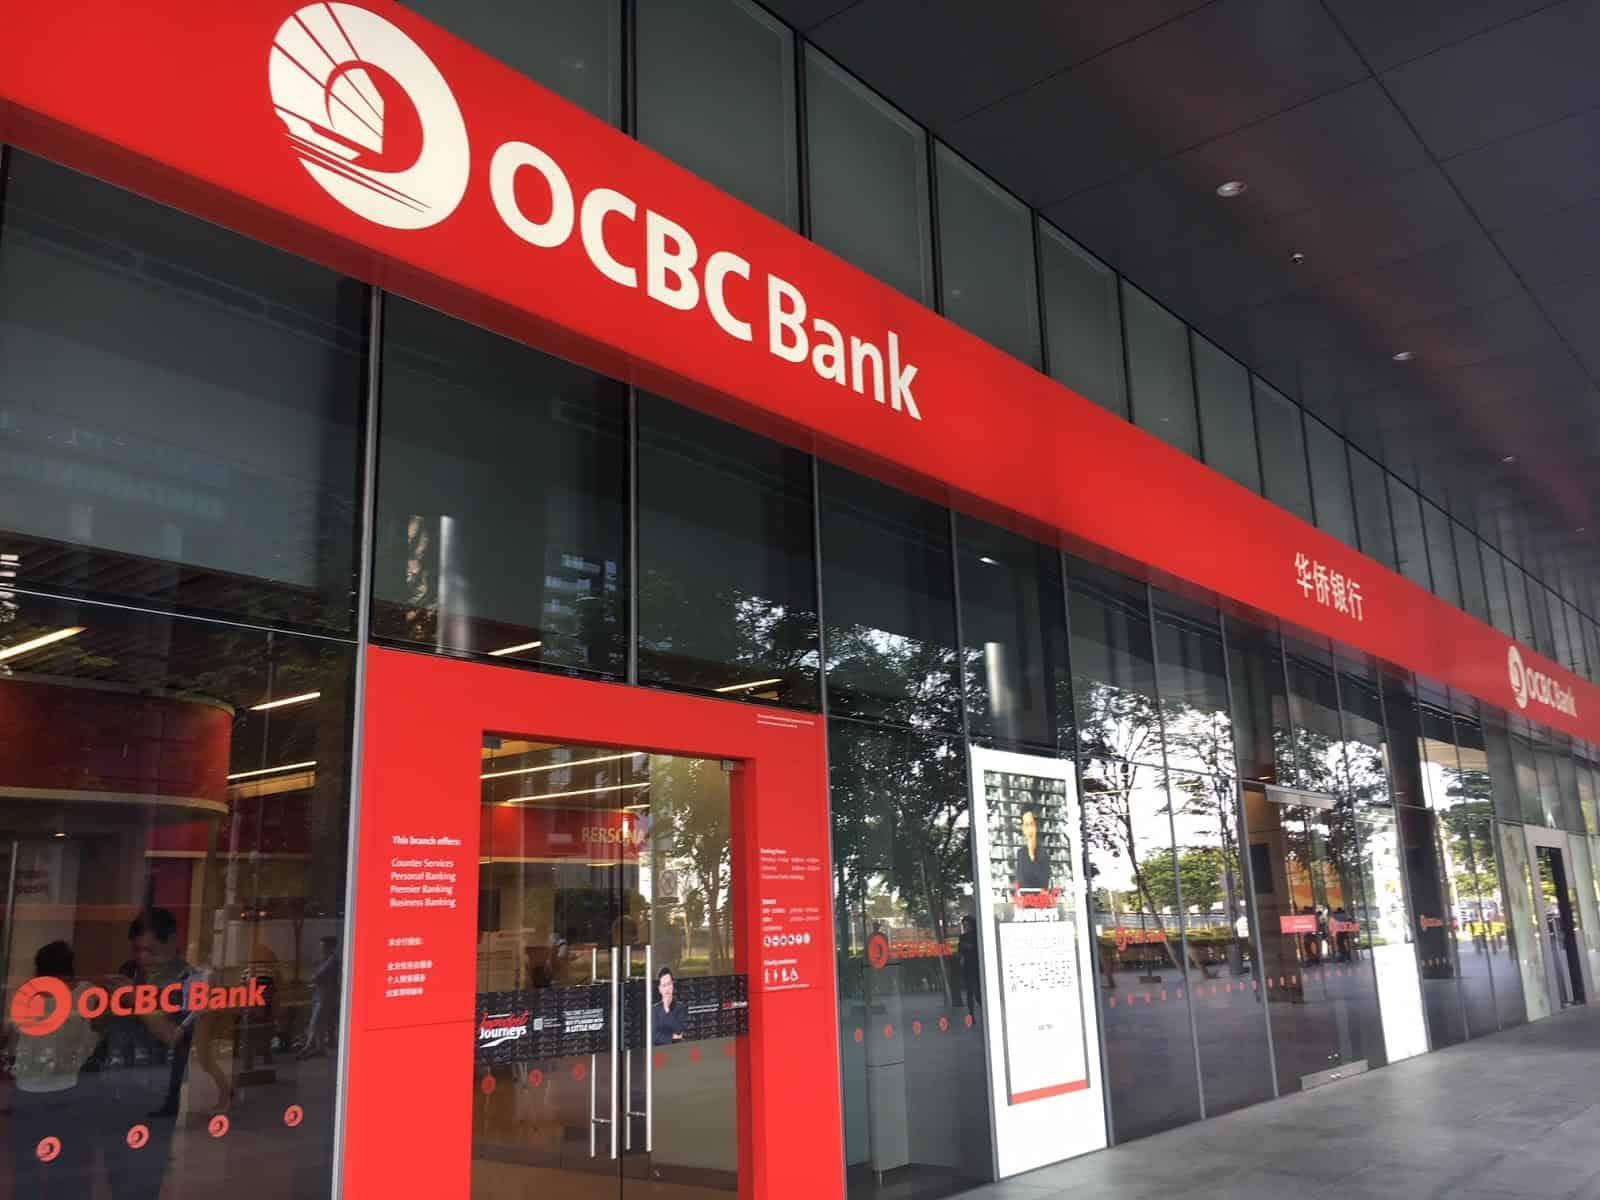 OCBC Bank – Will I buy this stock at $9.5?